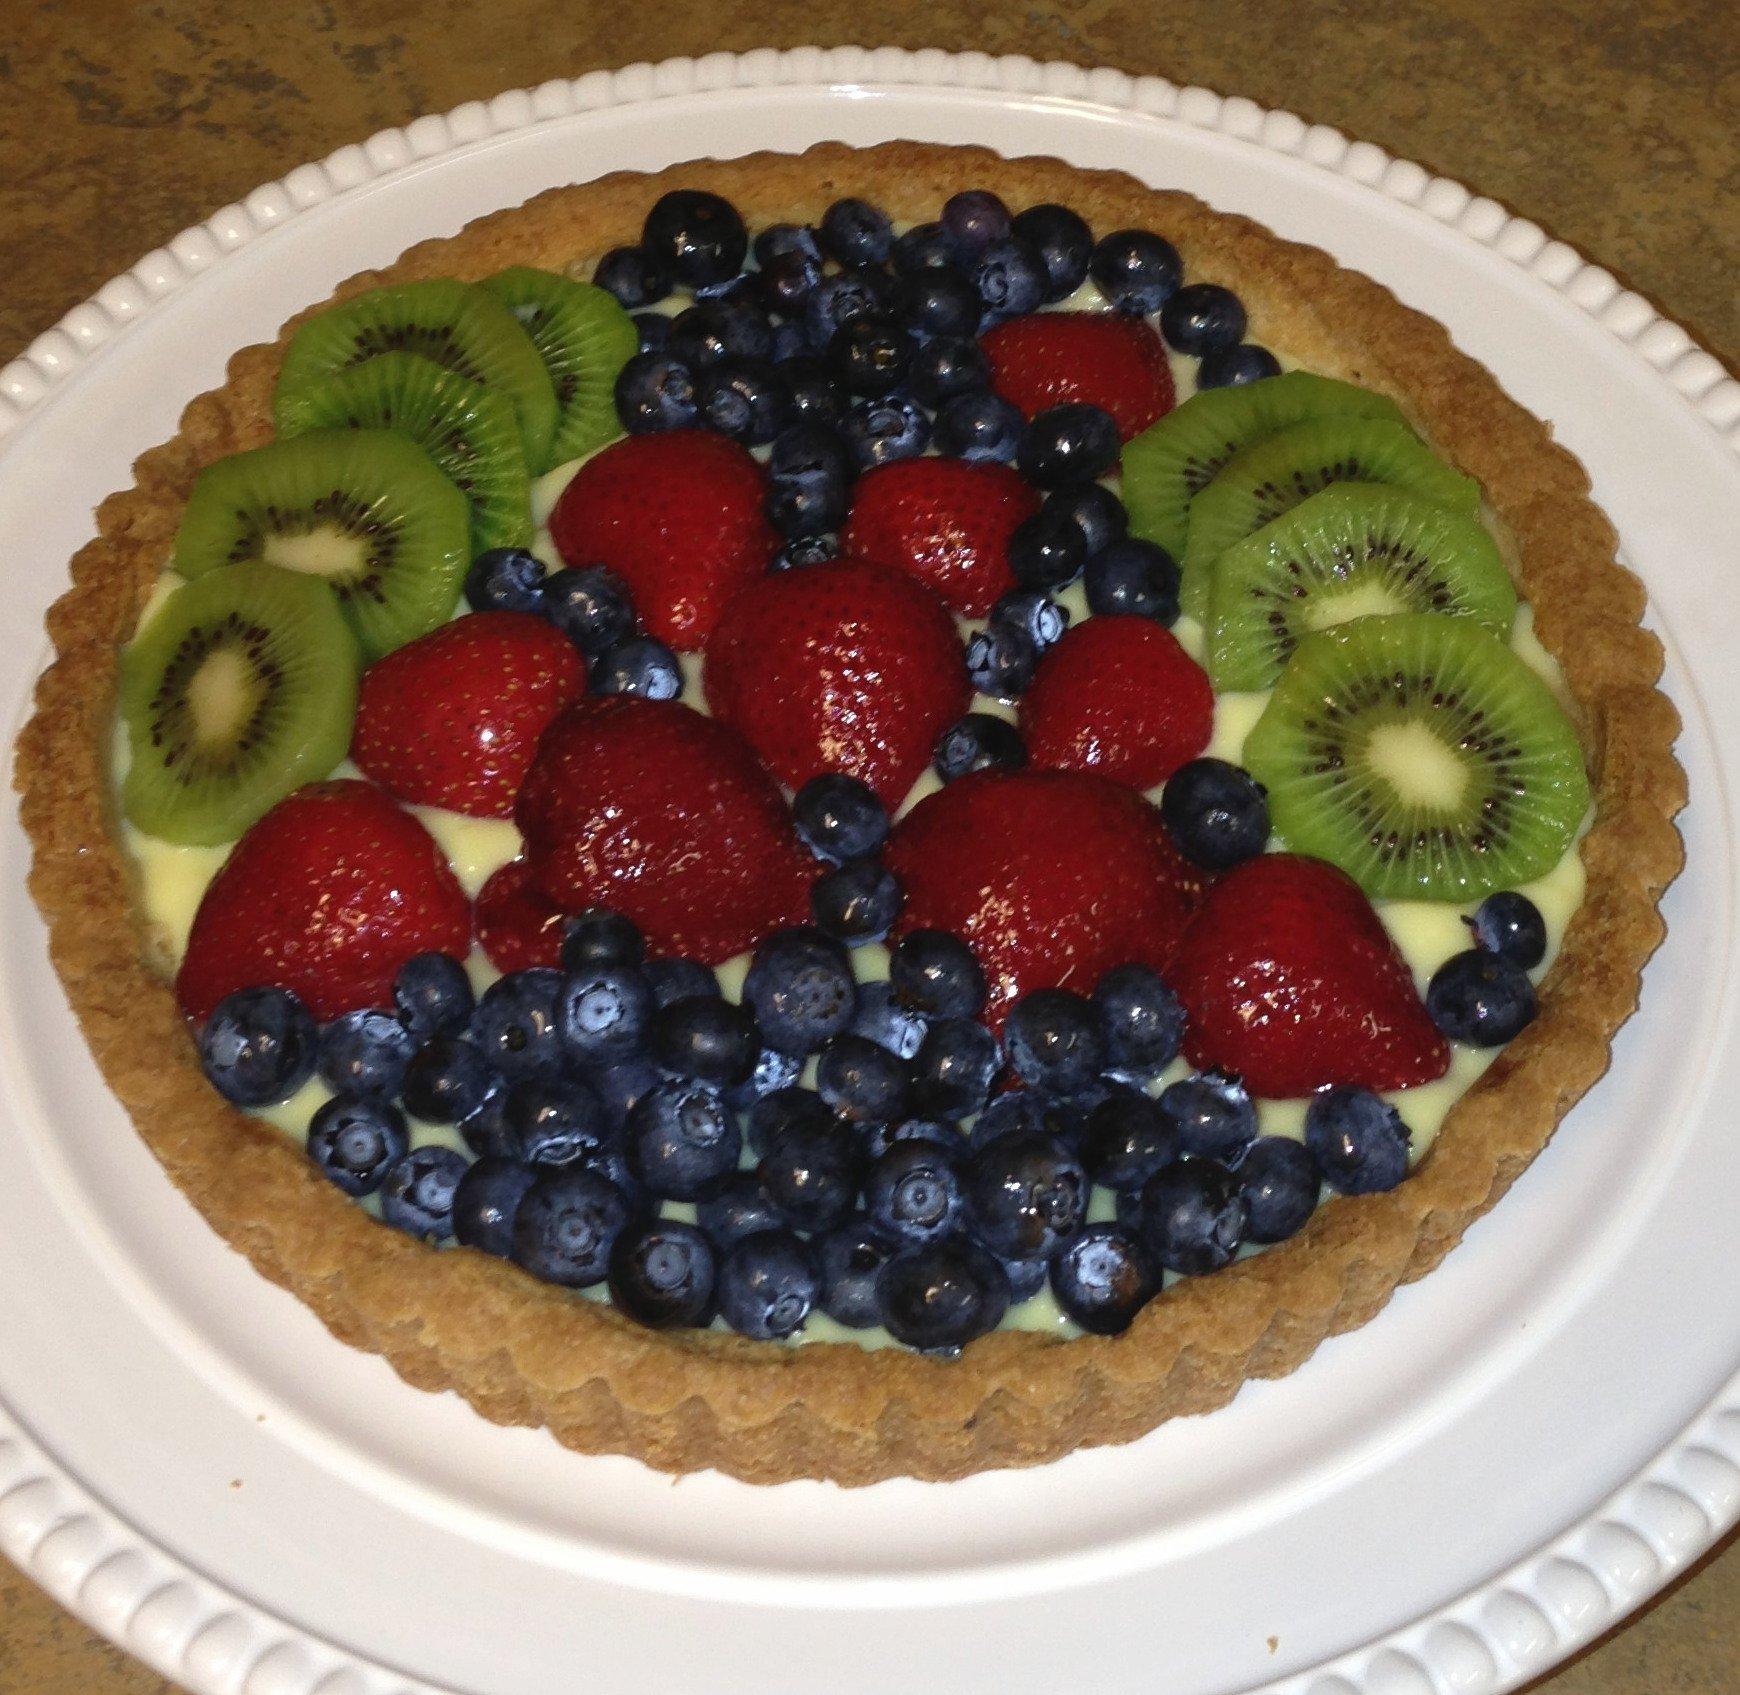 A little homemade Fruit Tart to start the day